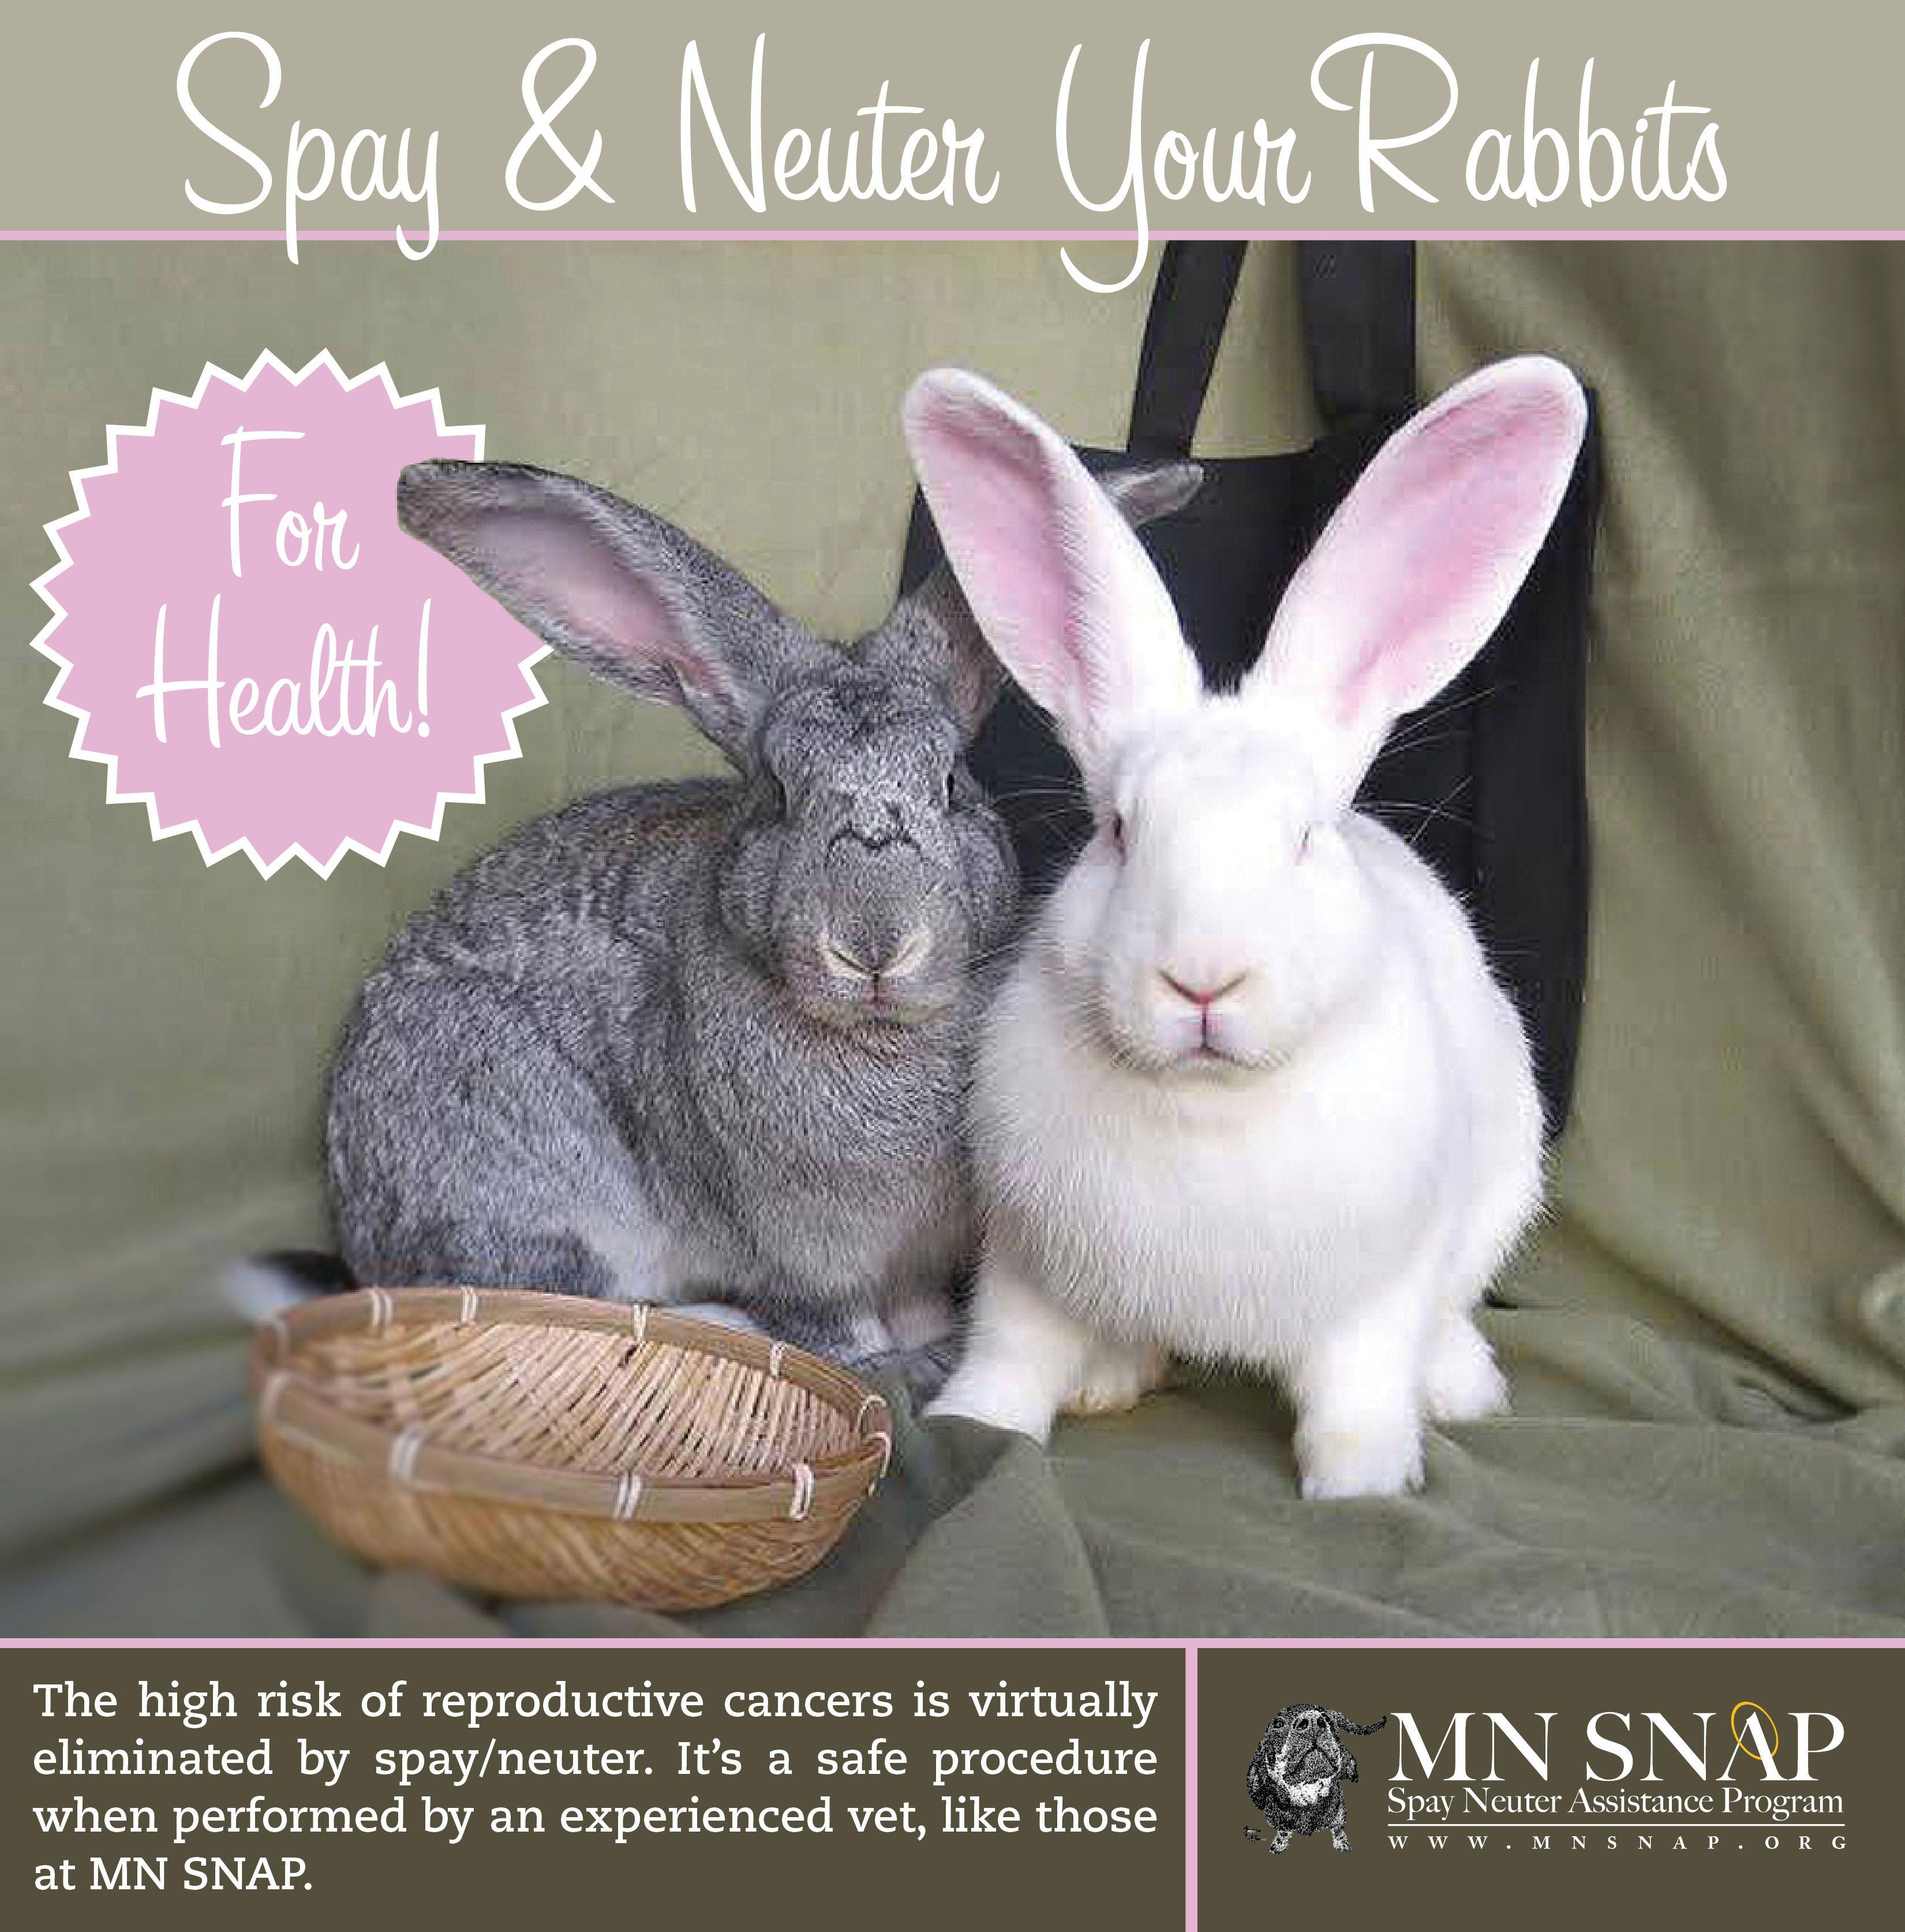 Minnesota Spay Neuter Assistance Minnesota Spay Neuter Assistance Program Adopt A Bunny Female Rabbit Bunny Care